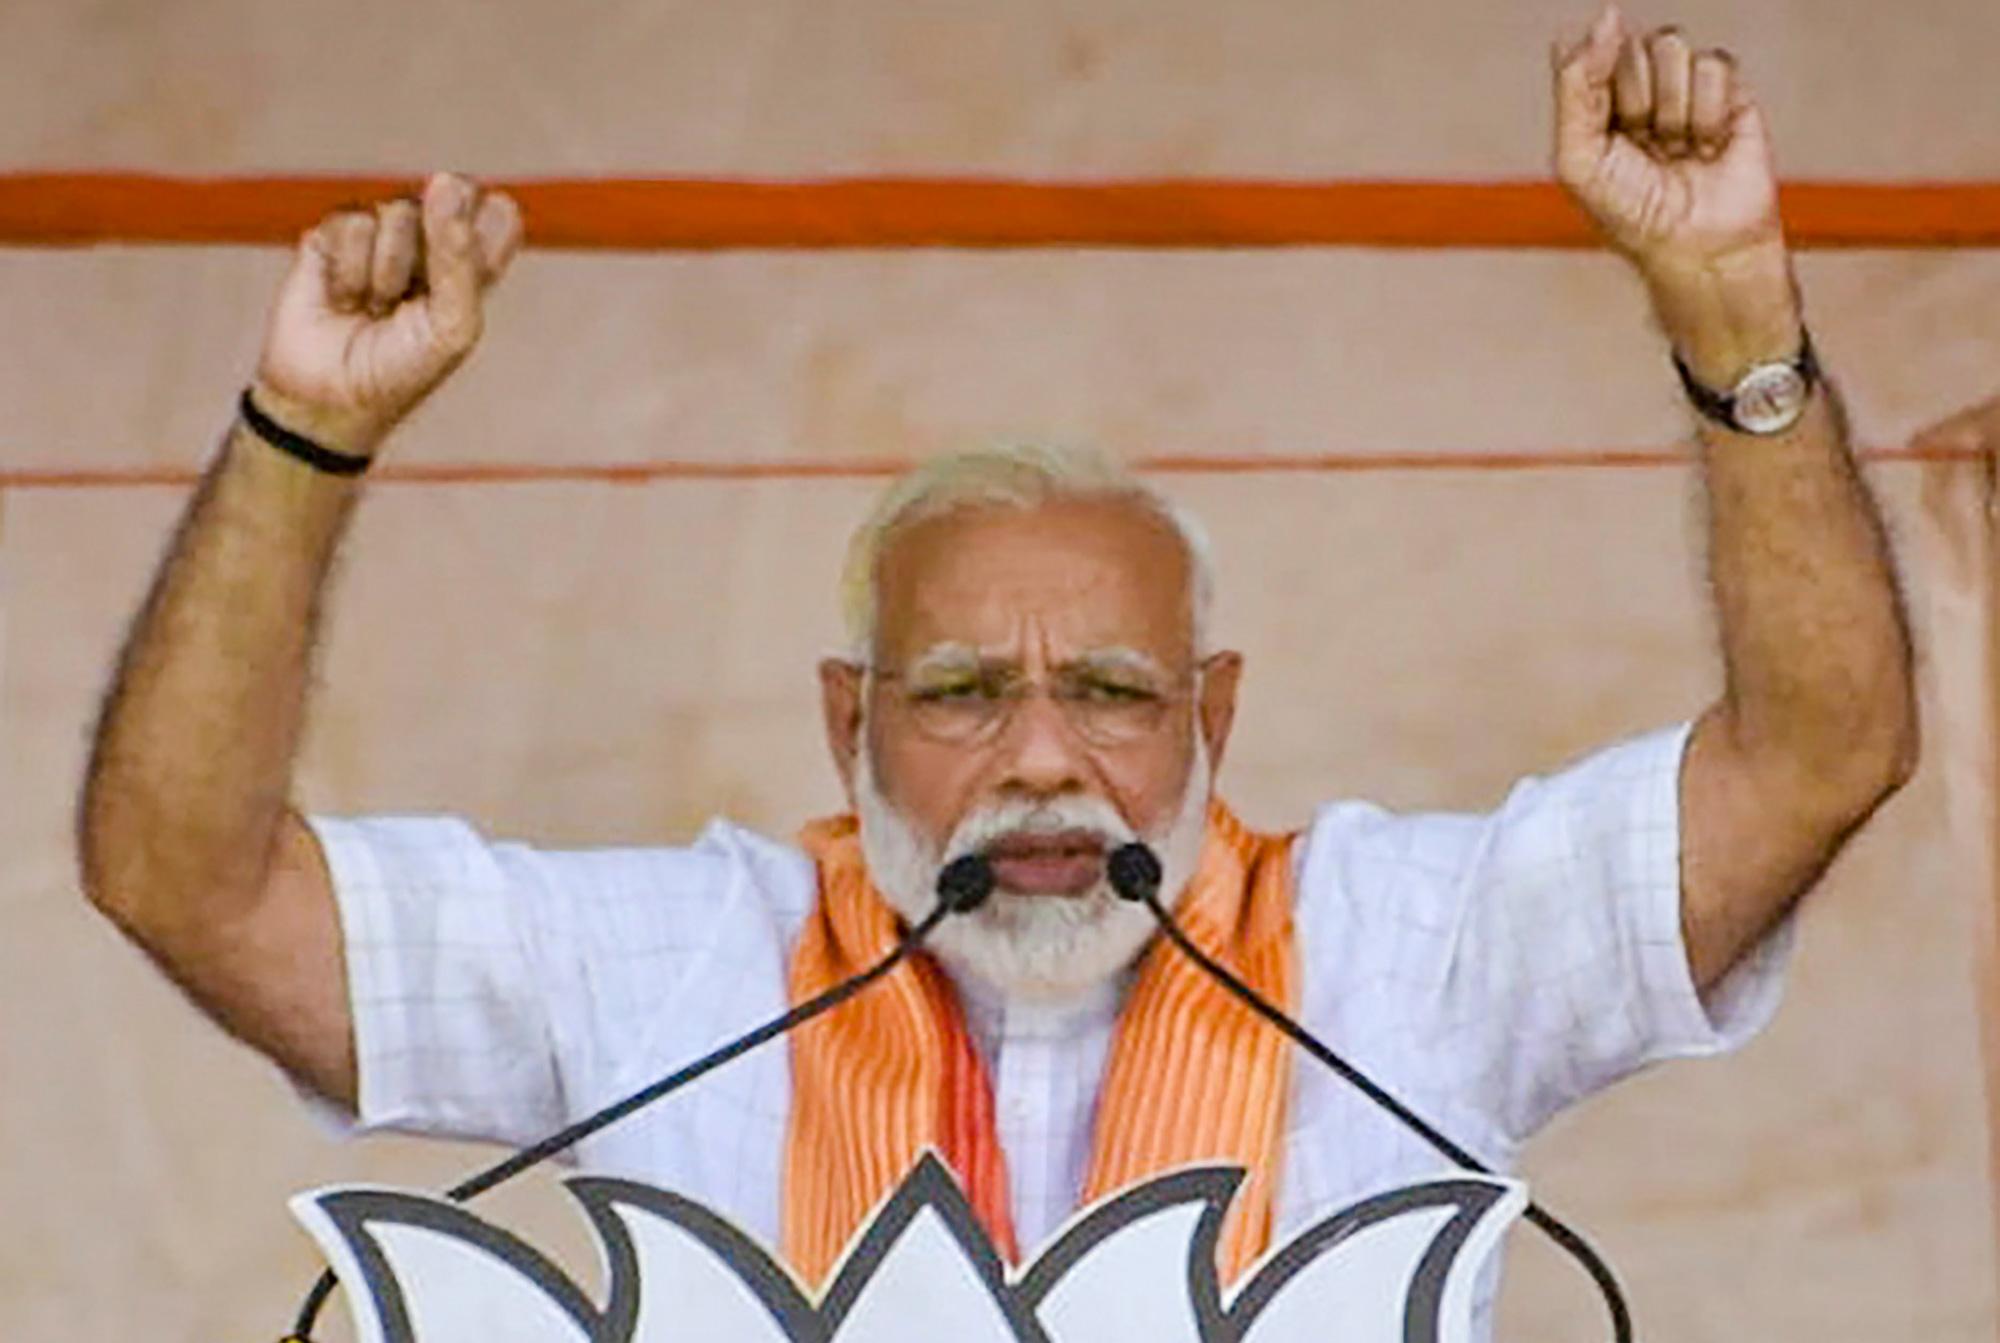 Prime Minister Narendra Modi addresses an election campaign for Lok Sabha polls, in Sitapur on Saturday, April 27, 2019.